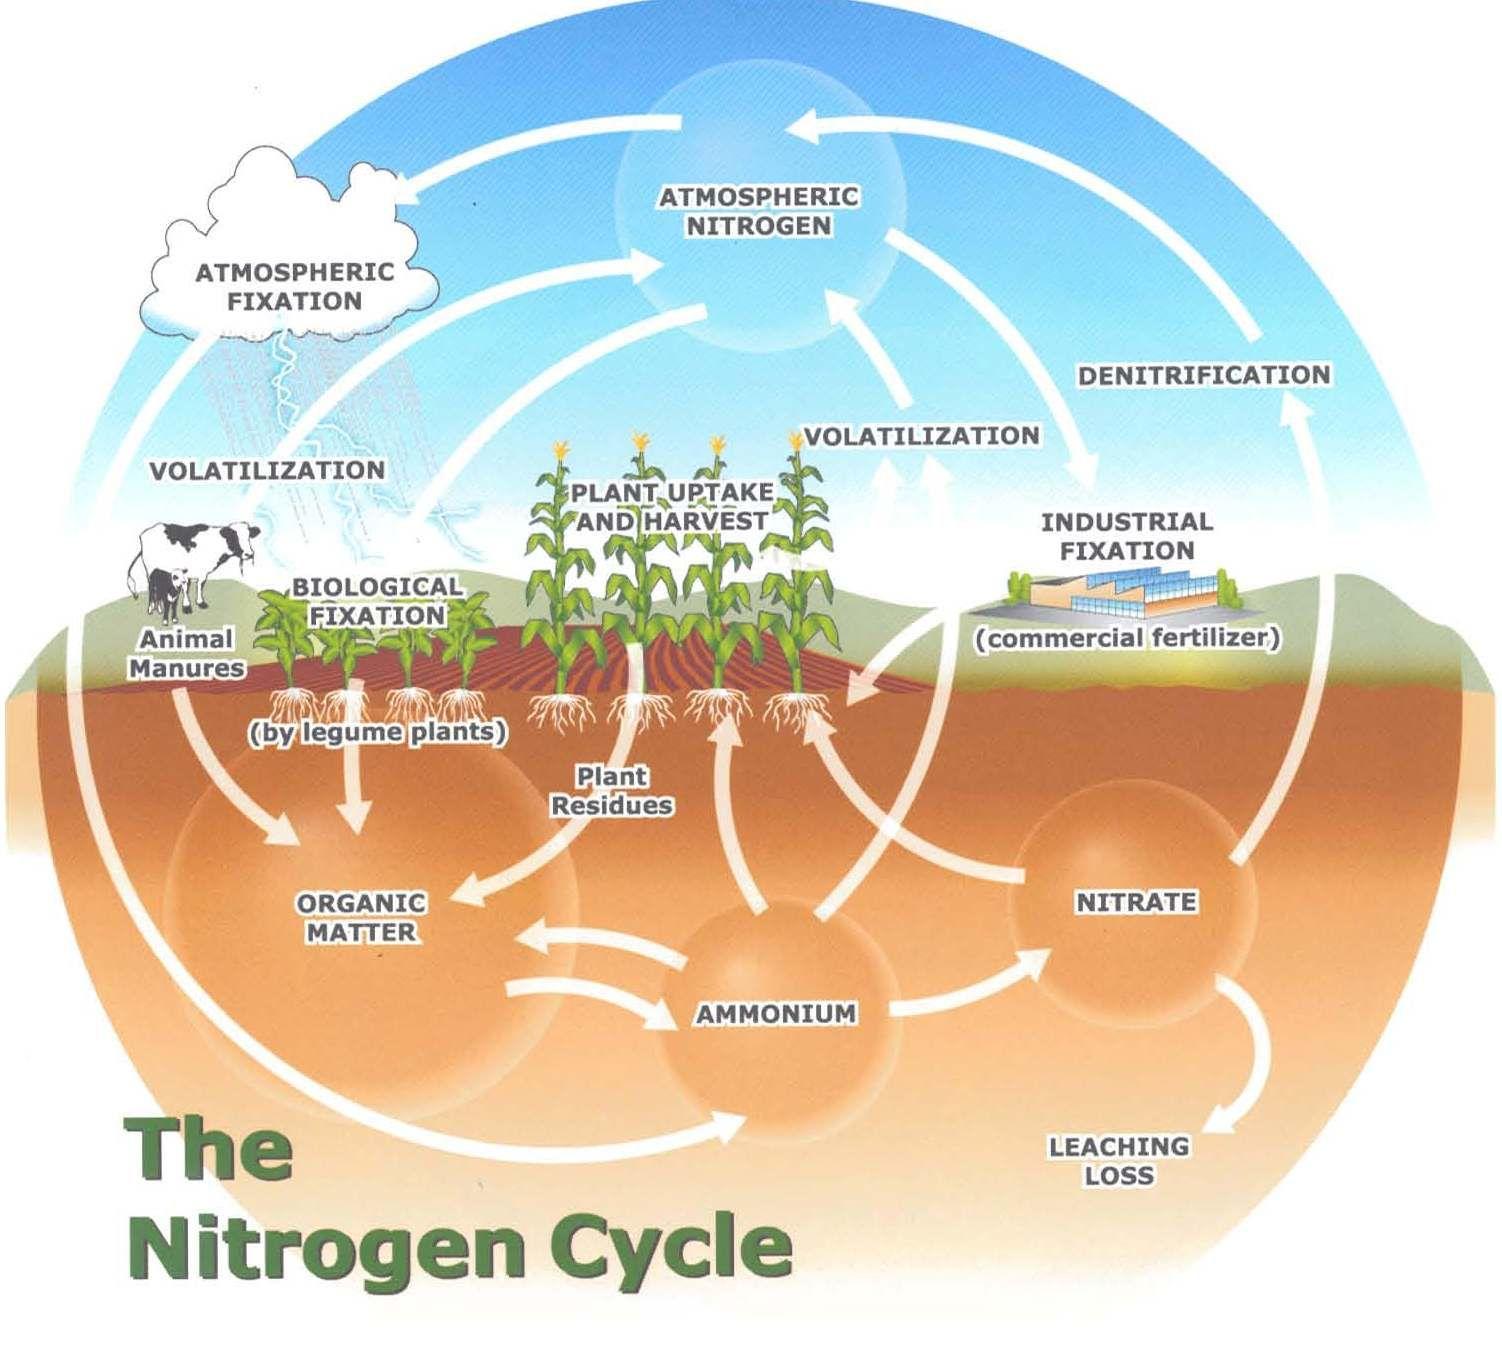 medium resolution of nitrogen cycle sources of atmospheric nitrogen decay of animal plant matter sinks for atmospheric nitrogen bacteria in soil plankton